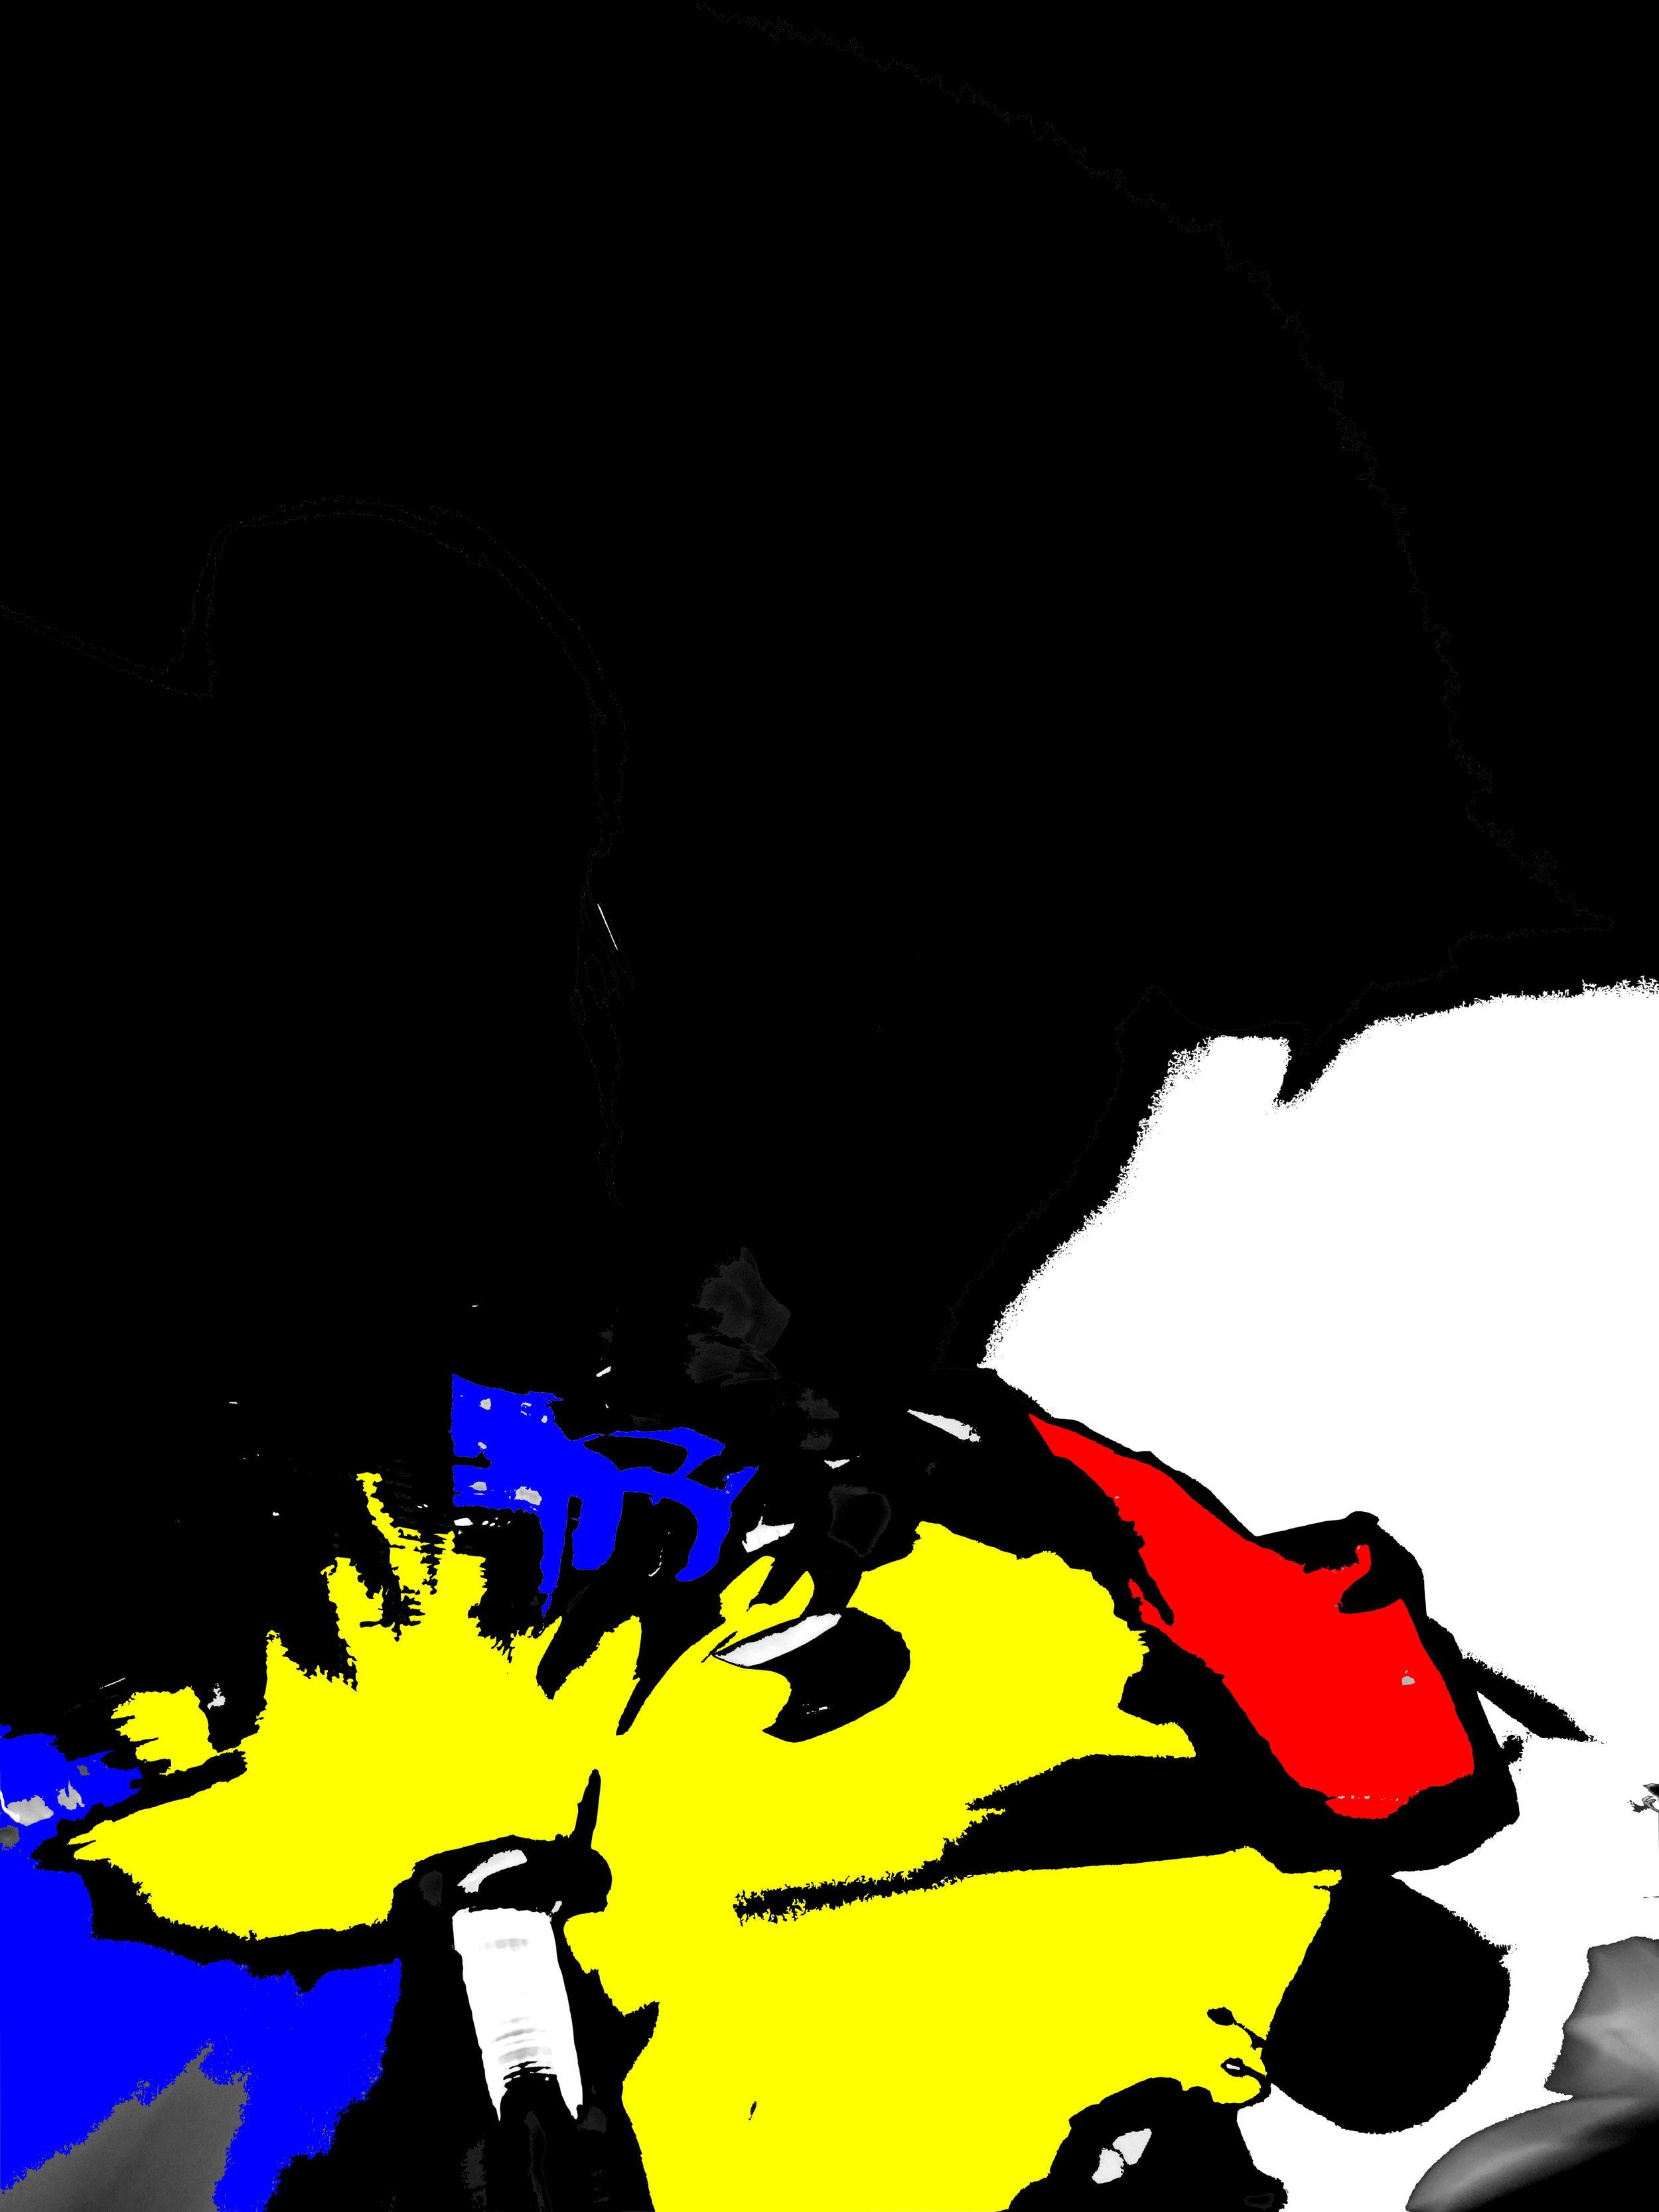 bnwcolor.jpg